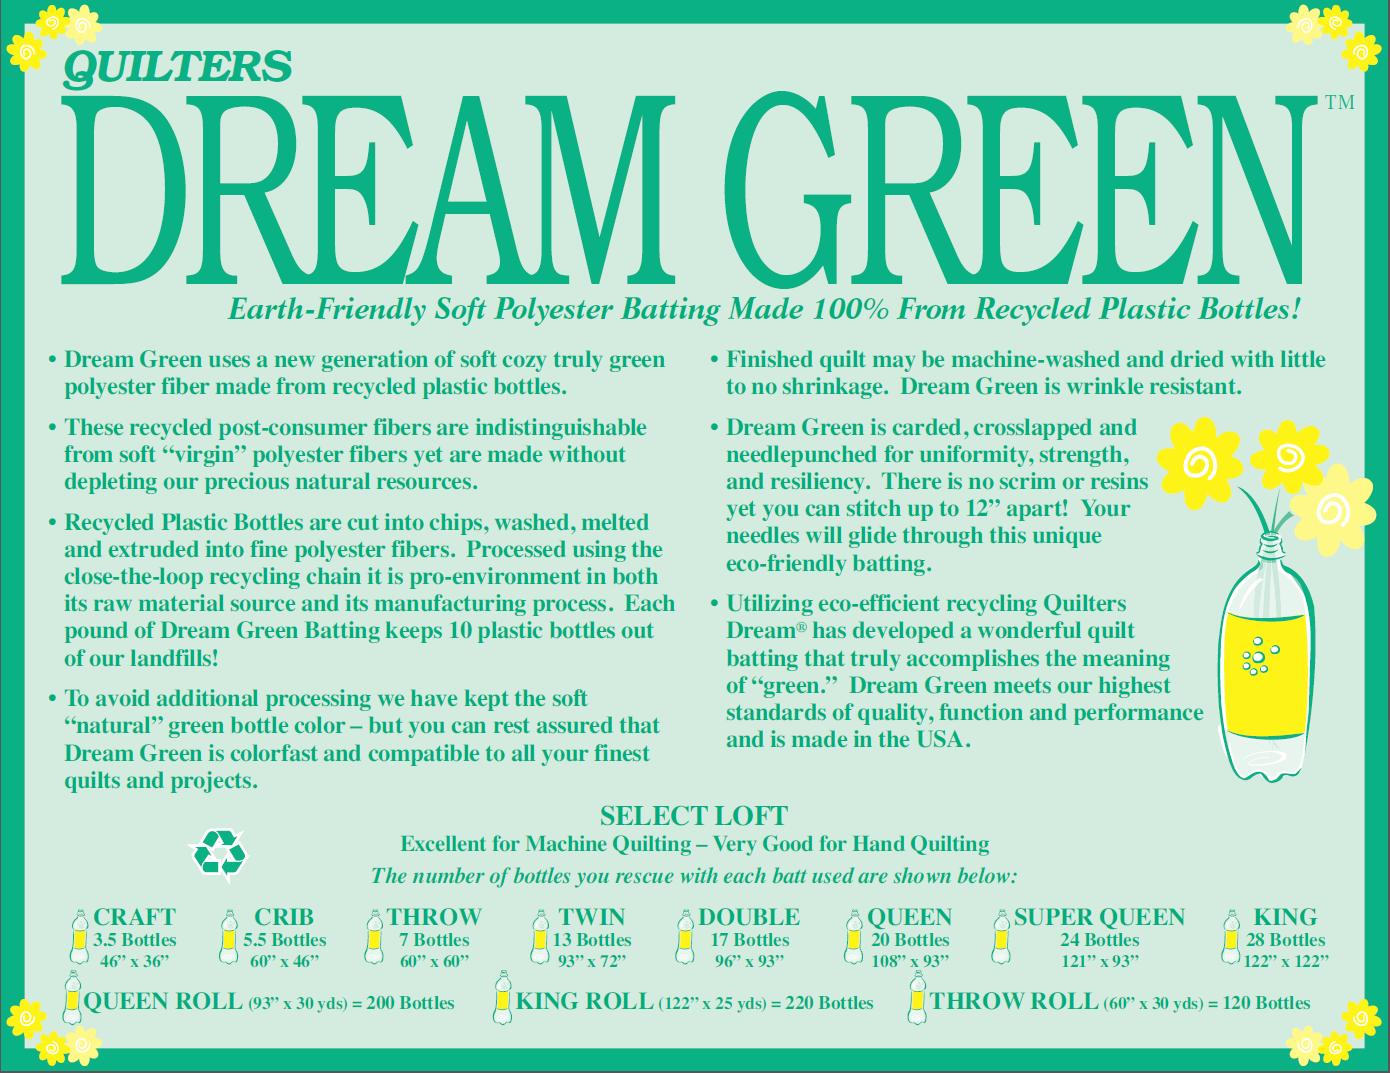 Batting - Quilter's Dream Green Queen